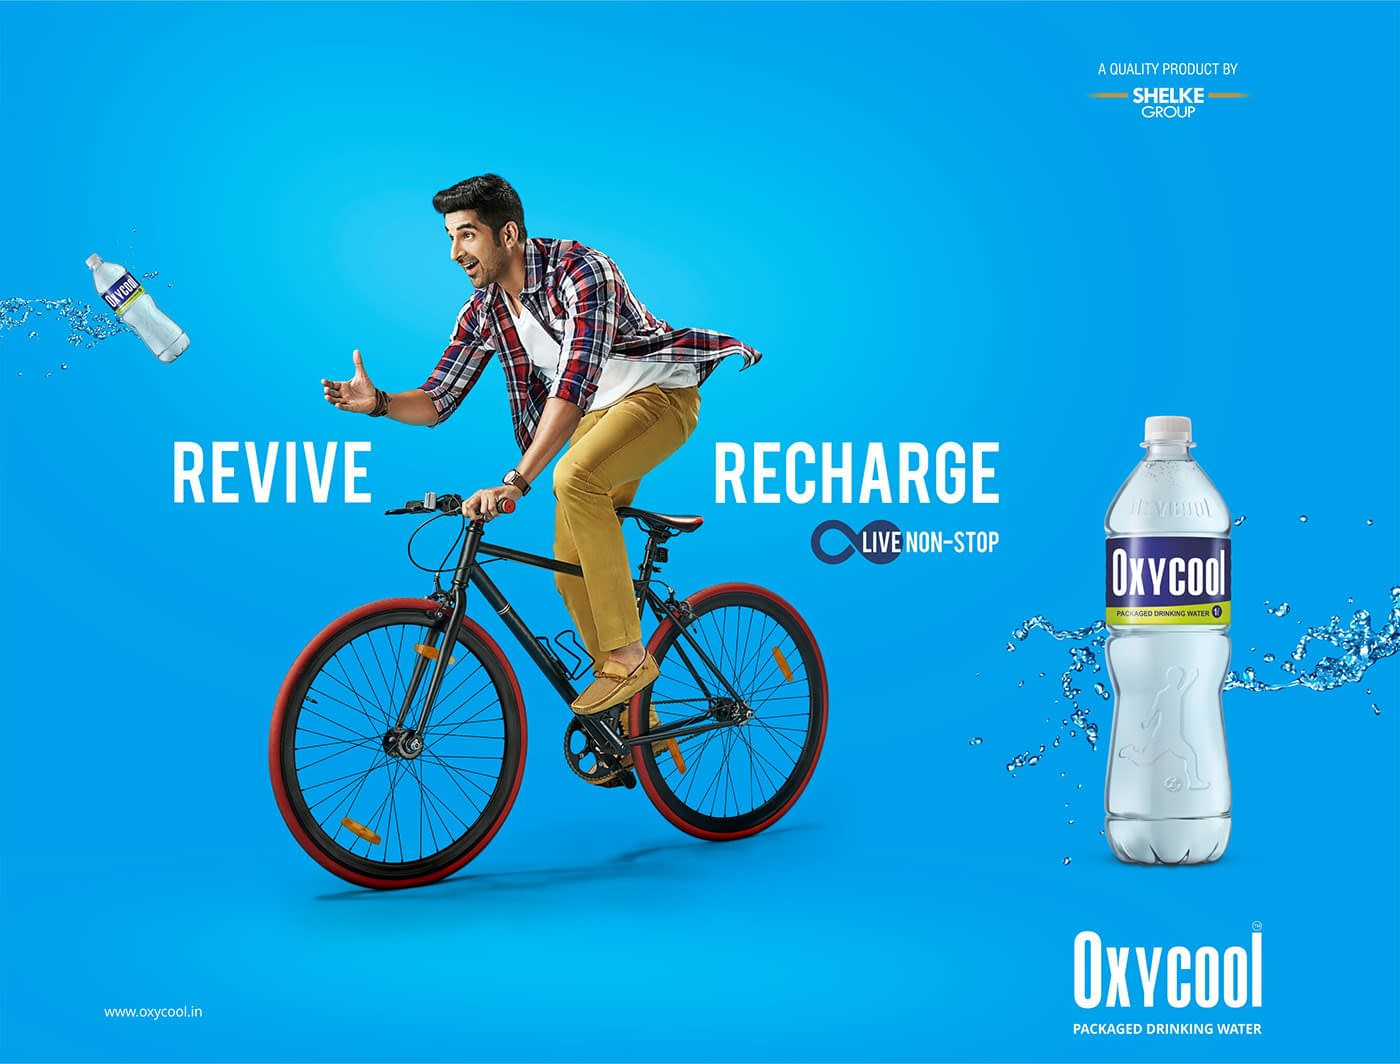 Creative Agency in Pune